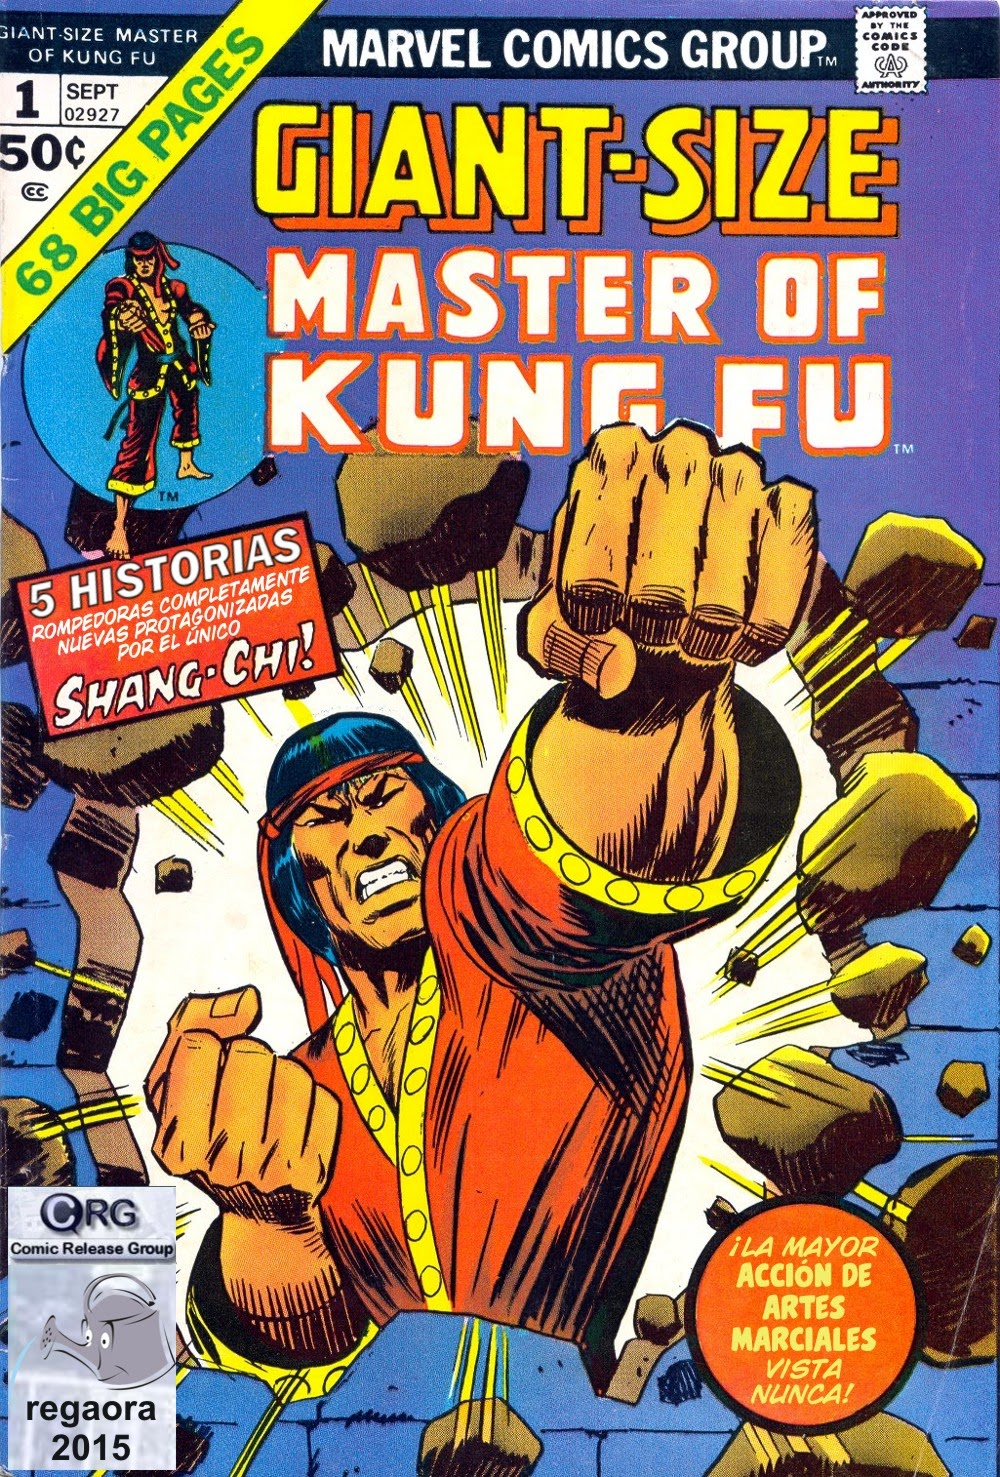 Portada de Master of Kung Fu Giant-Size #1 traducido